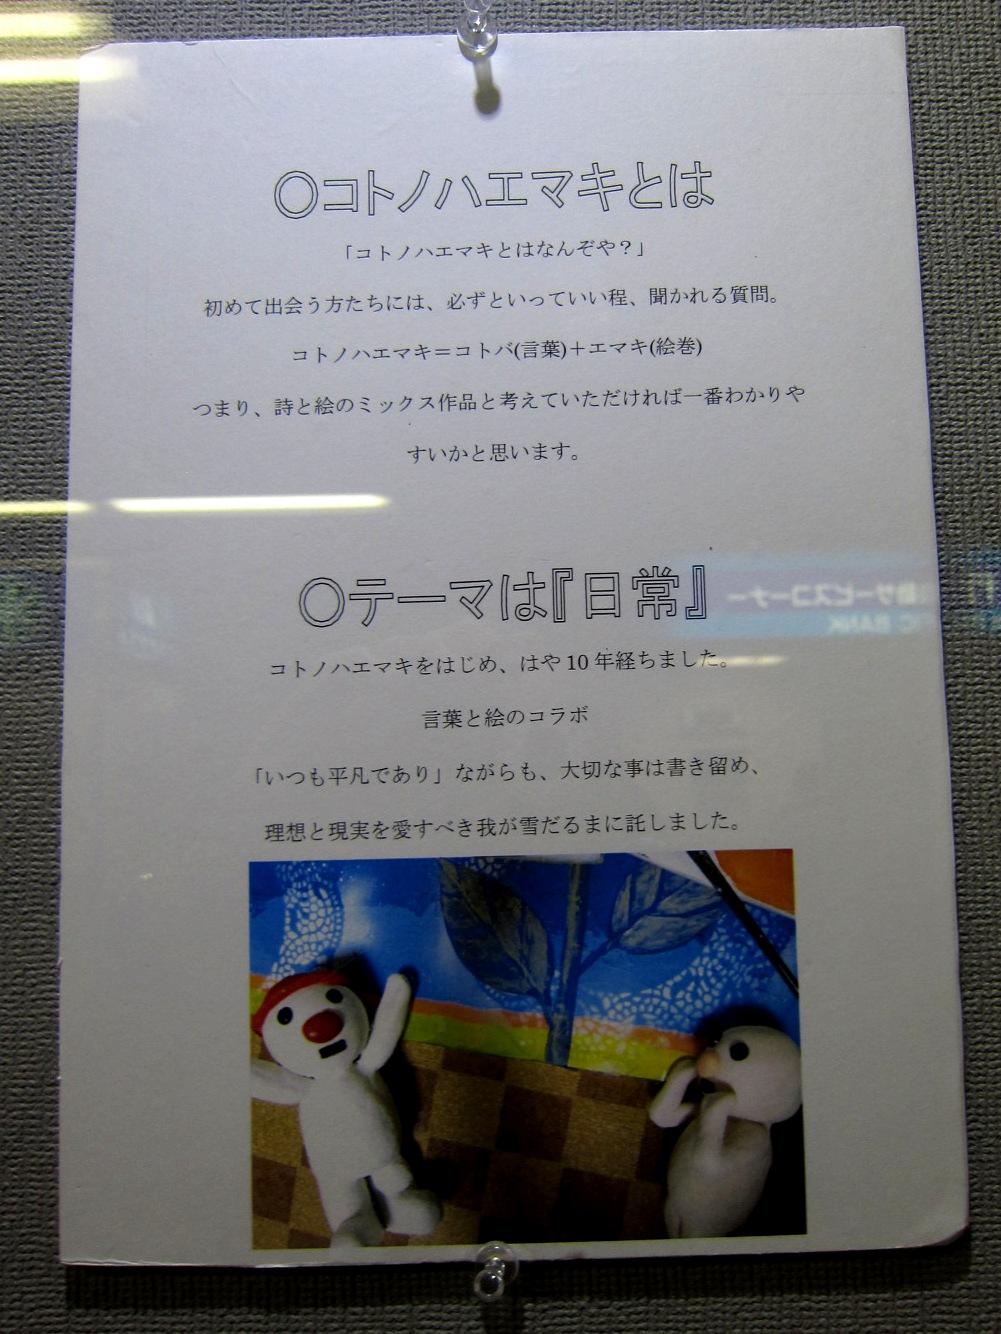 2216)「(YUKO個展)コトノハエマキinメトロギャラリ-」 円山公園駅メトロg. 9月4日(水)~9月26日(木) _f0126829_0183395.jpg